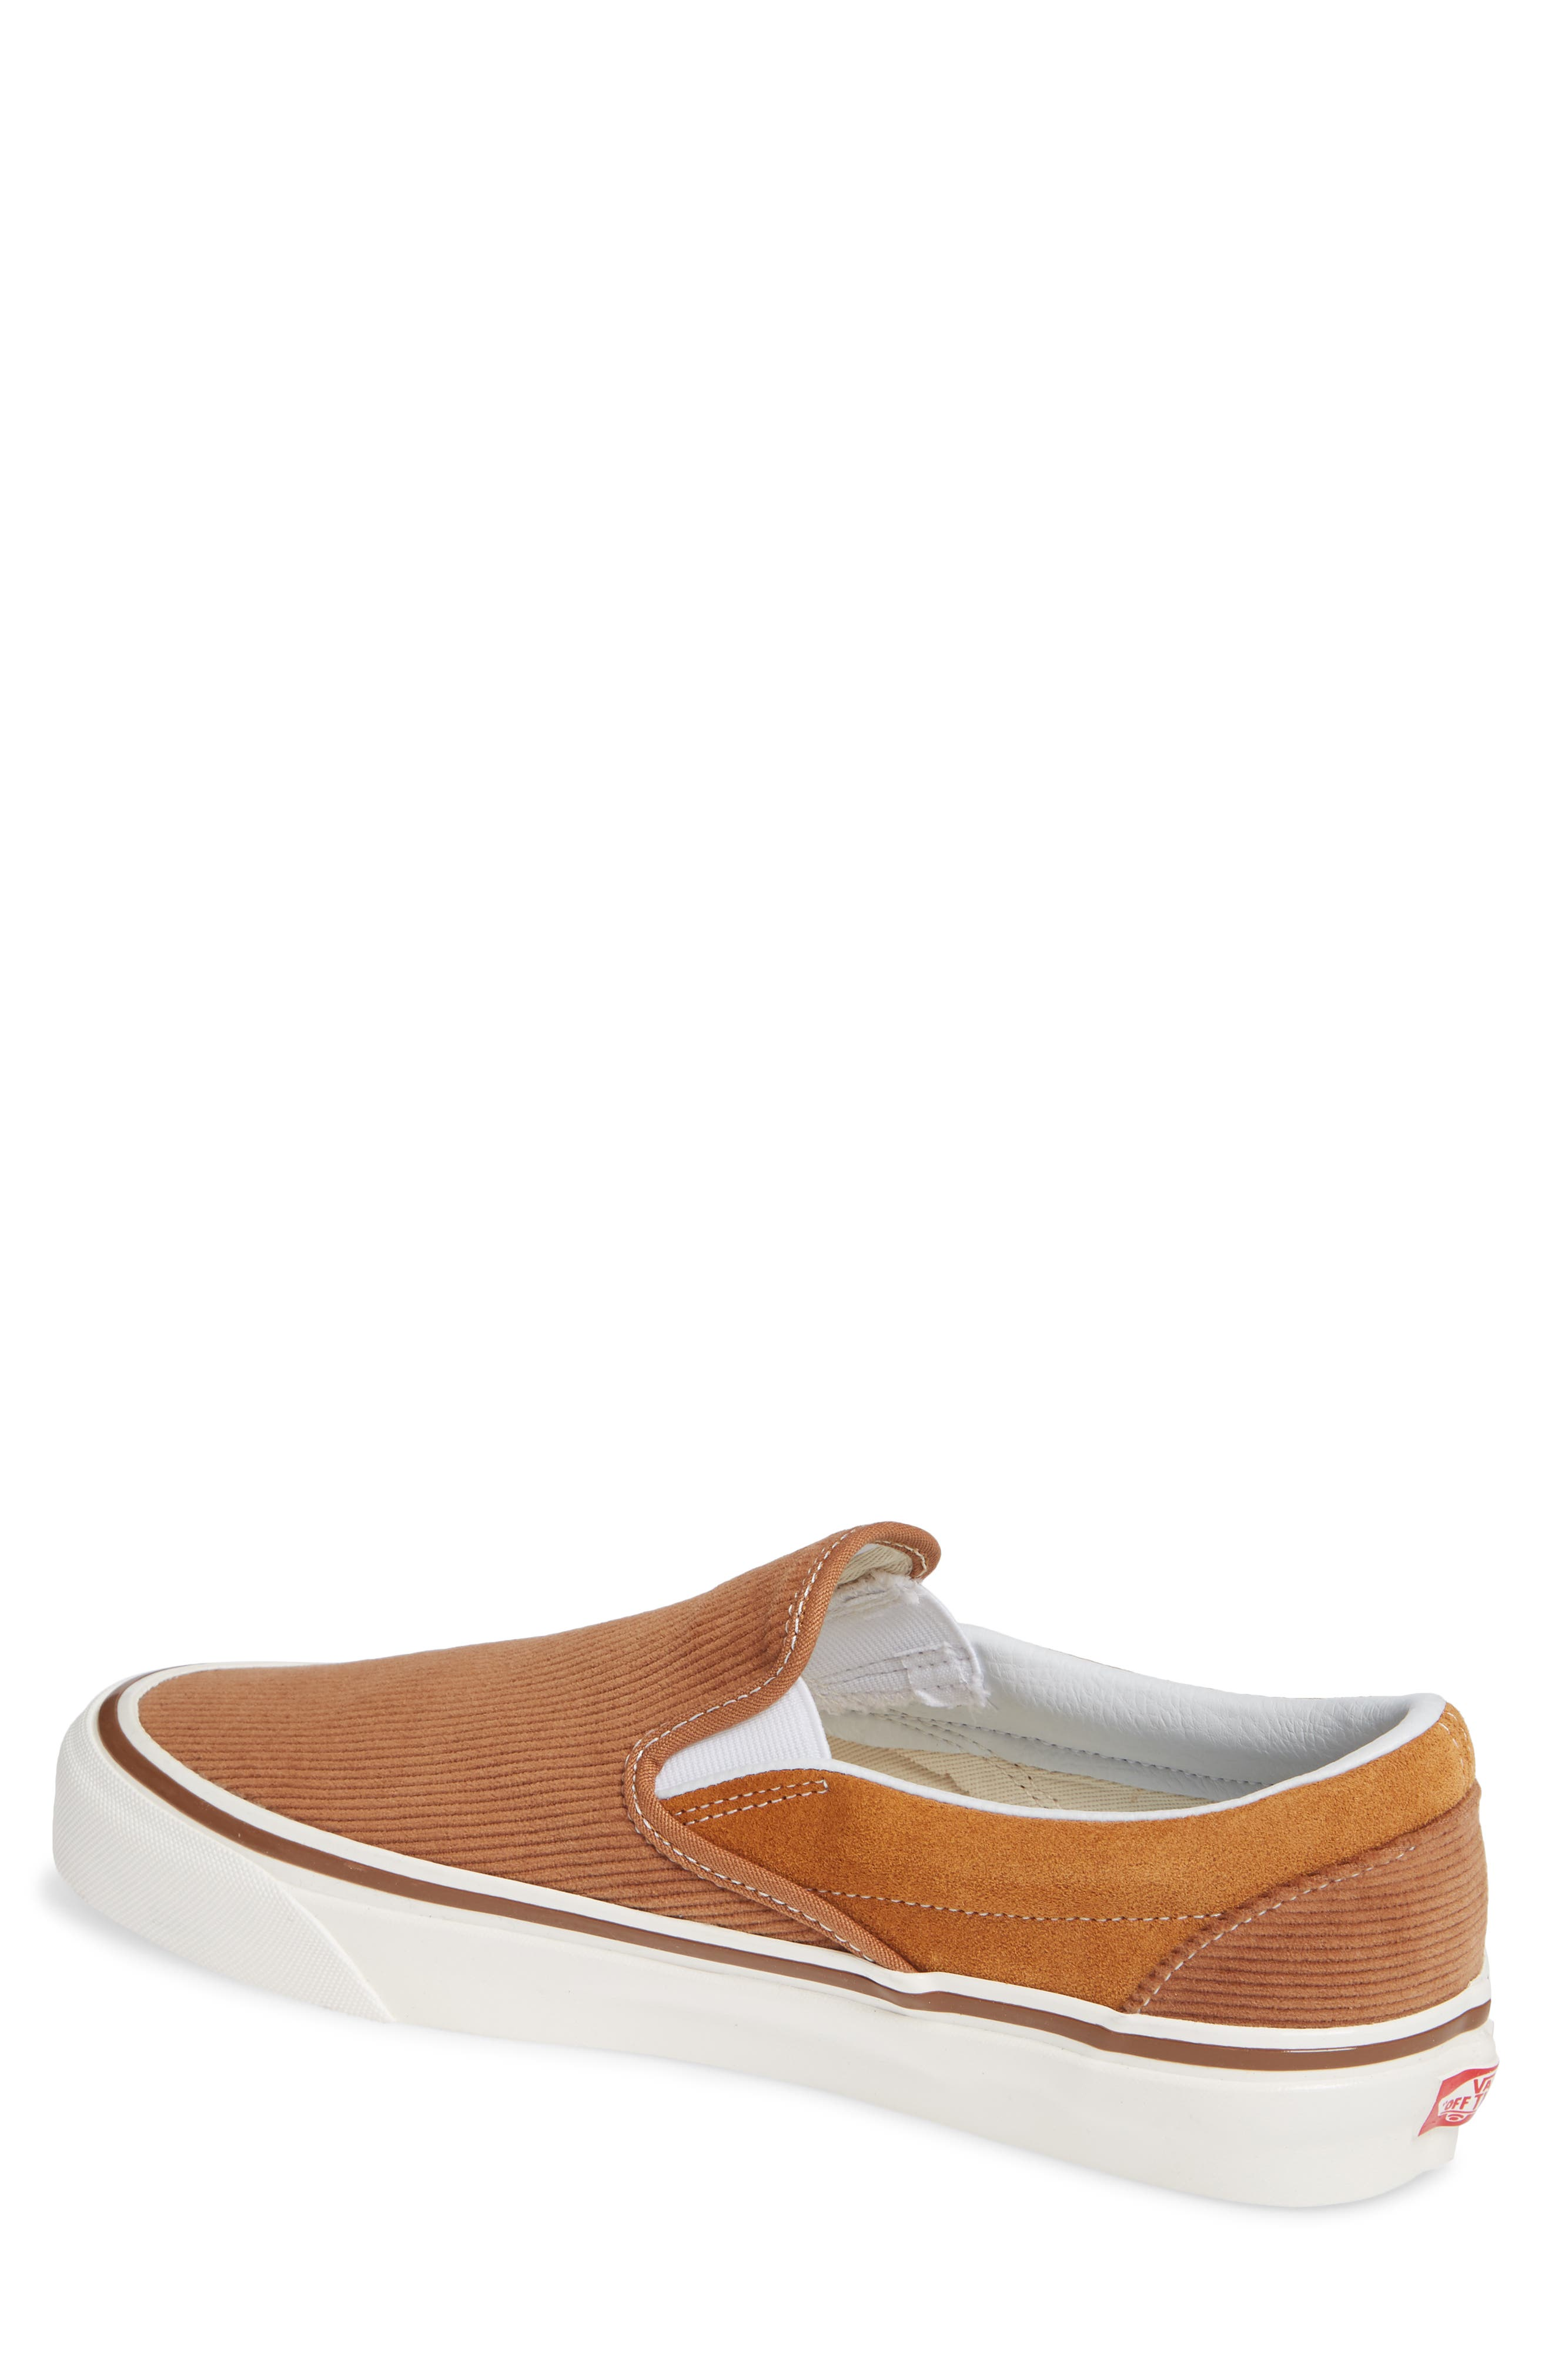 Classic 98 DX Slip-On Sneaker,                             Alternate thumbnail 2, color,                             BROWN/ CORDUROY